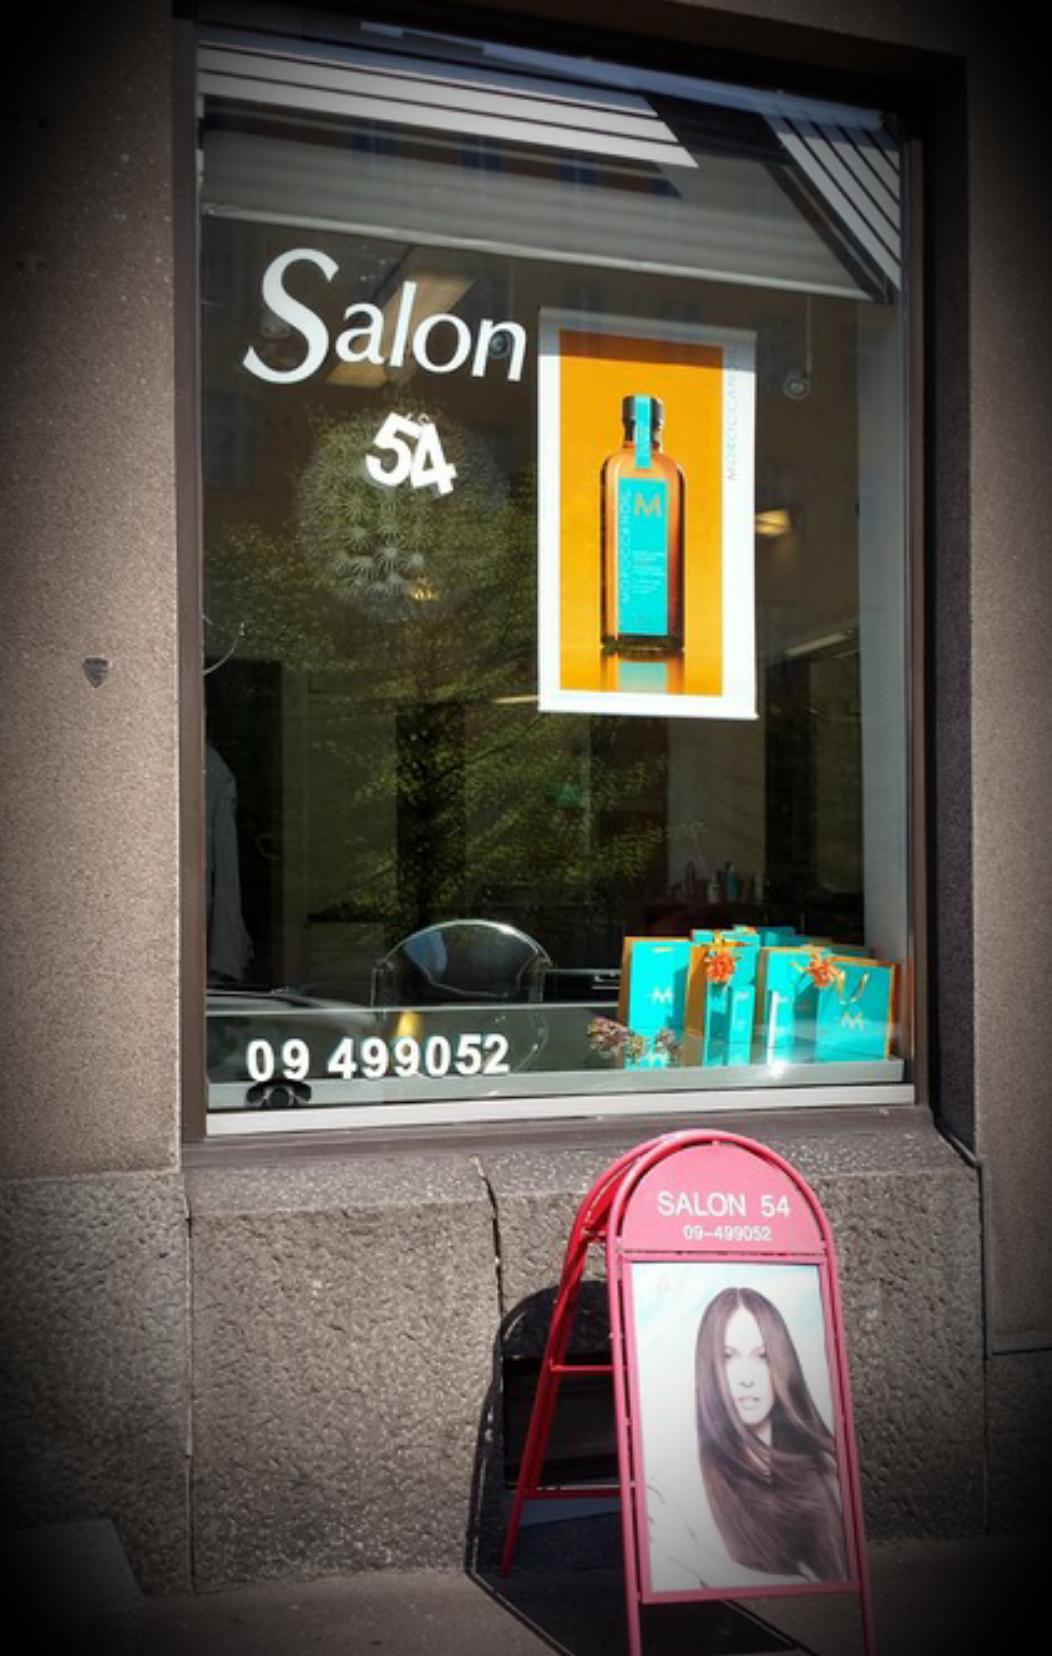 Salon54